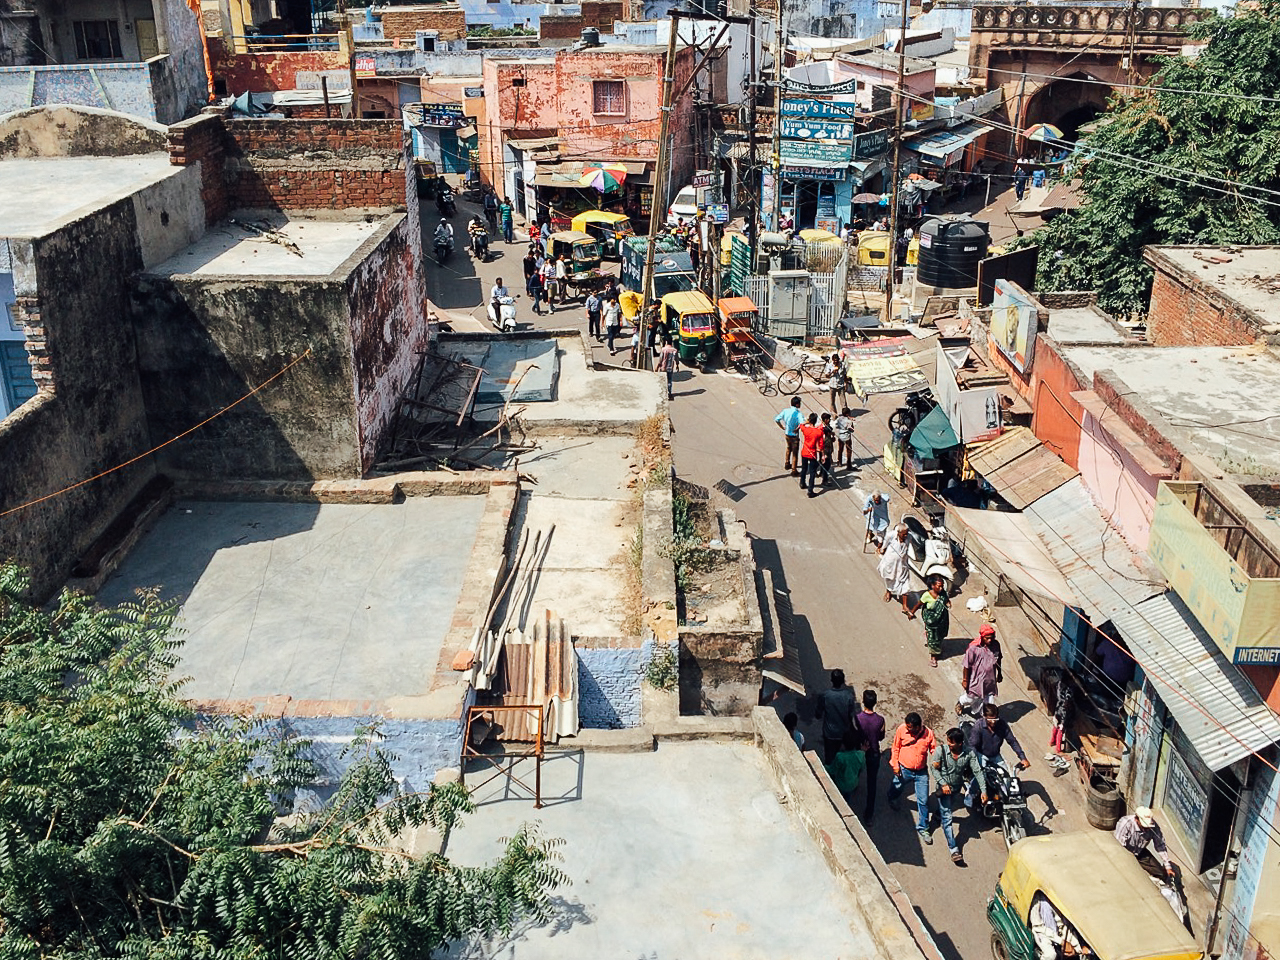 Путешествие по Индии: Таджганж, Агра